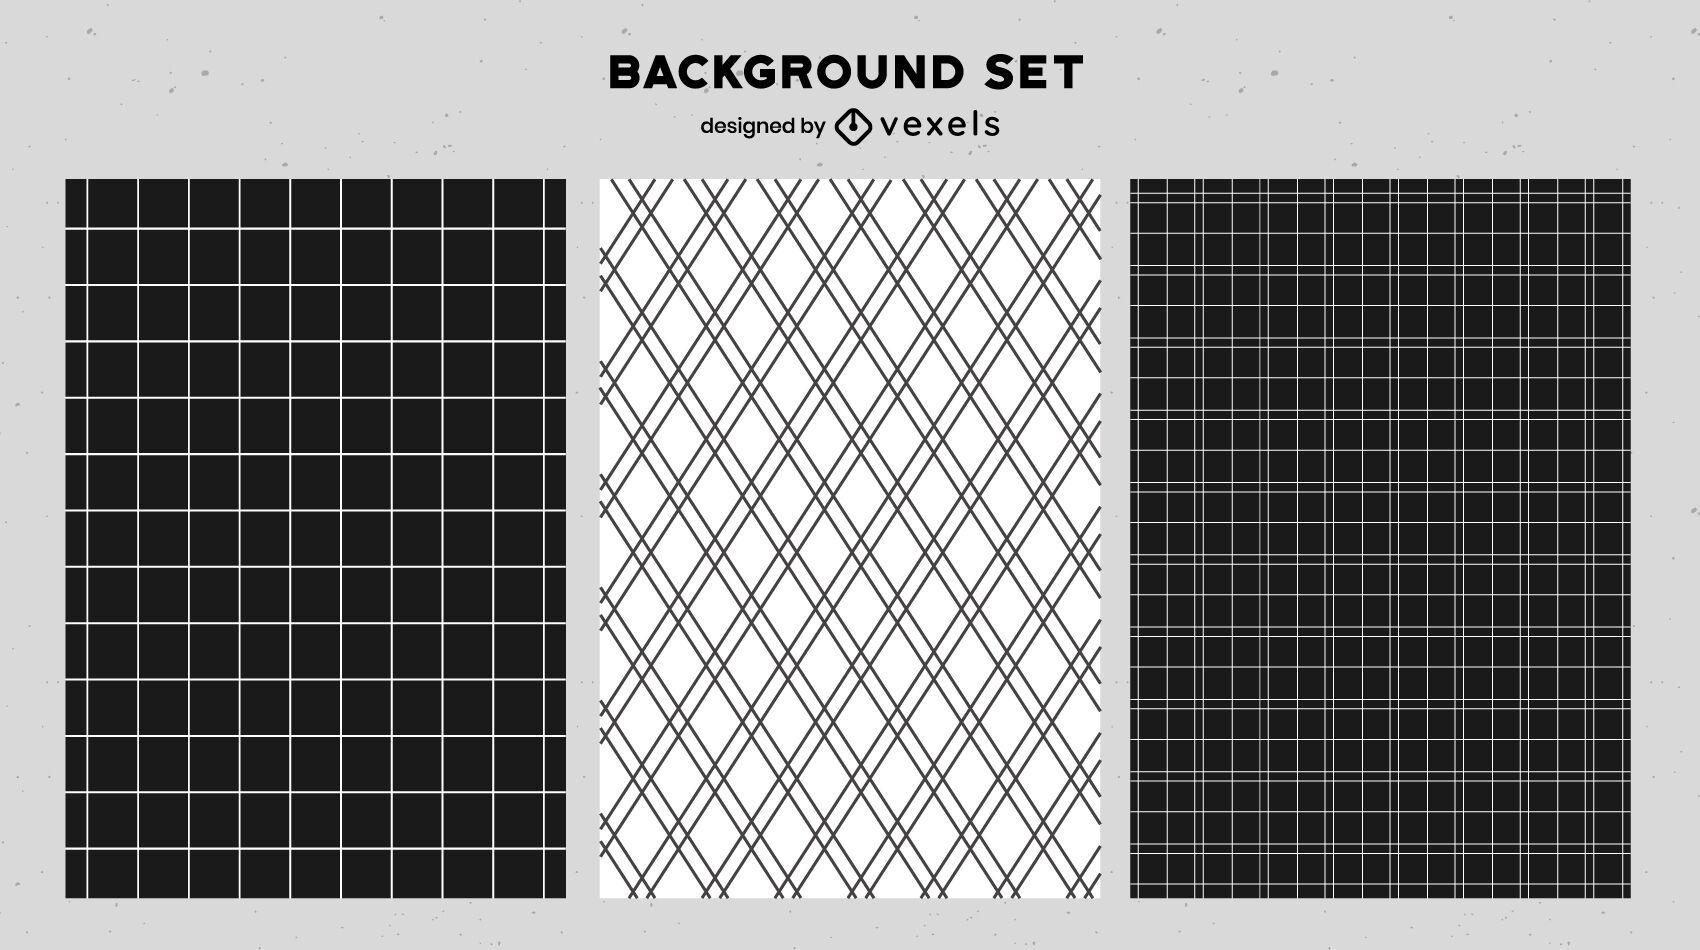 Black and white background set